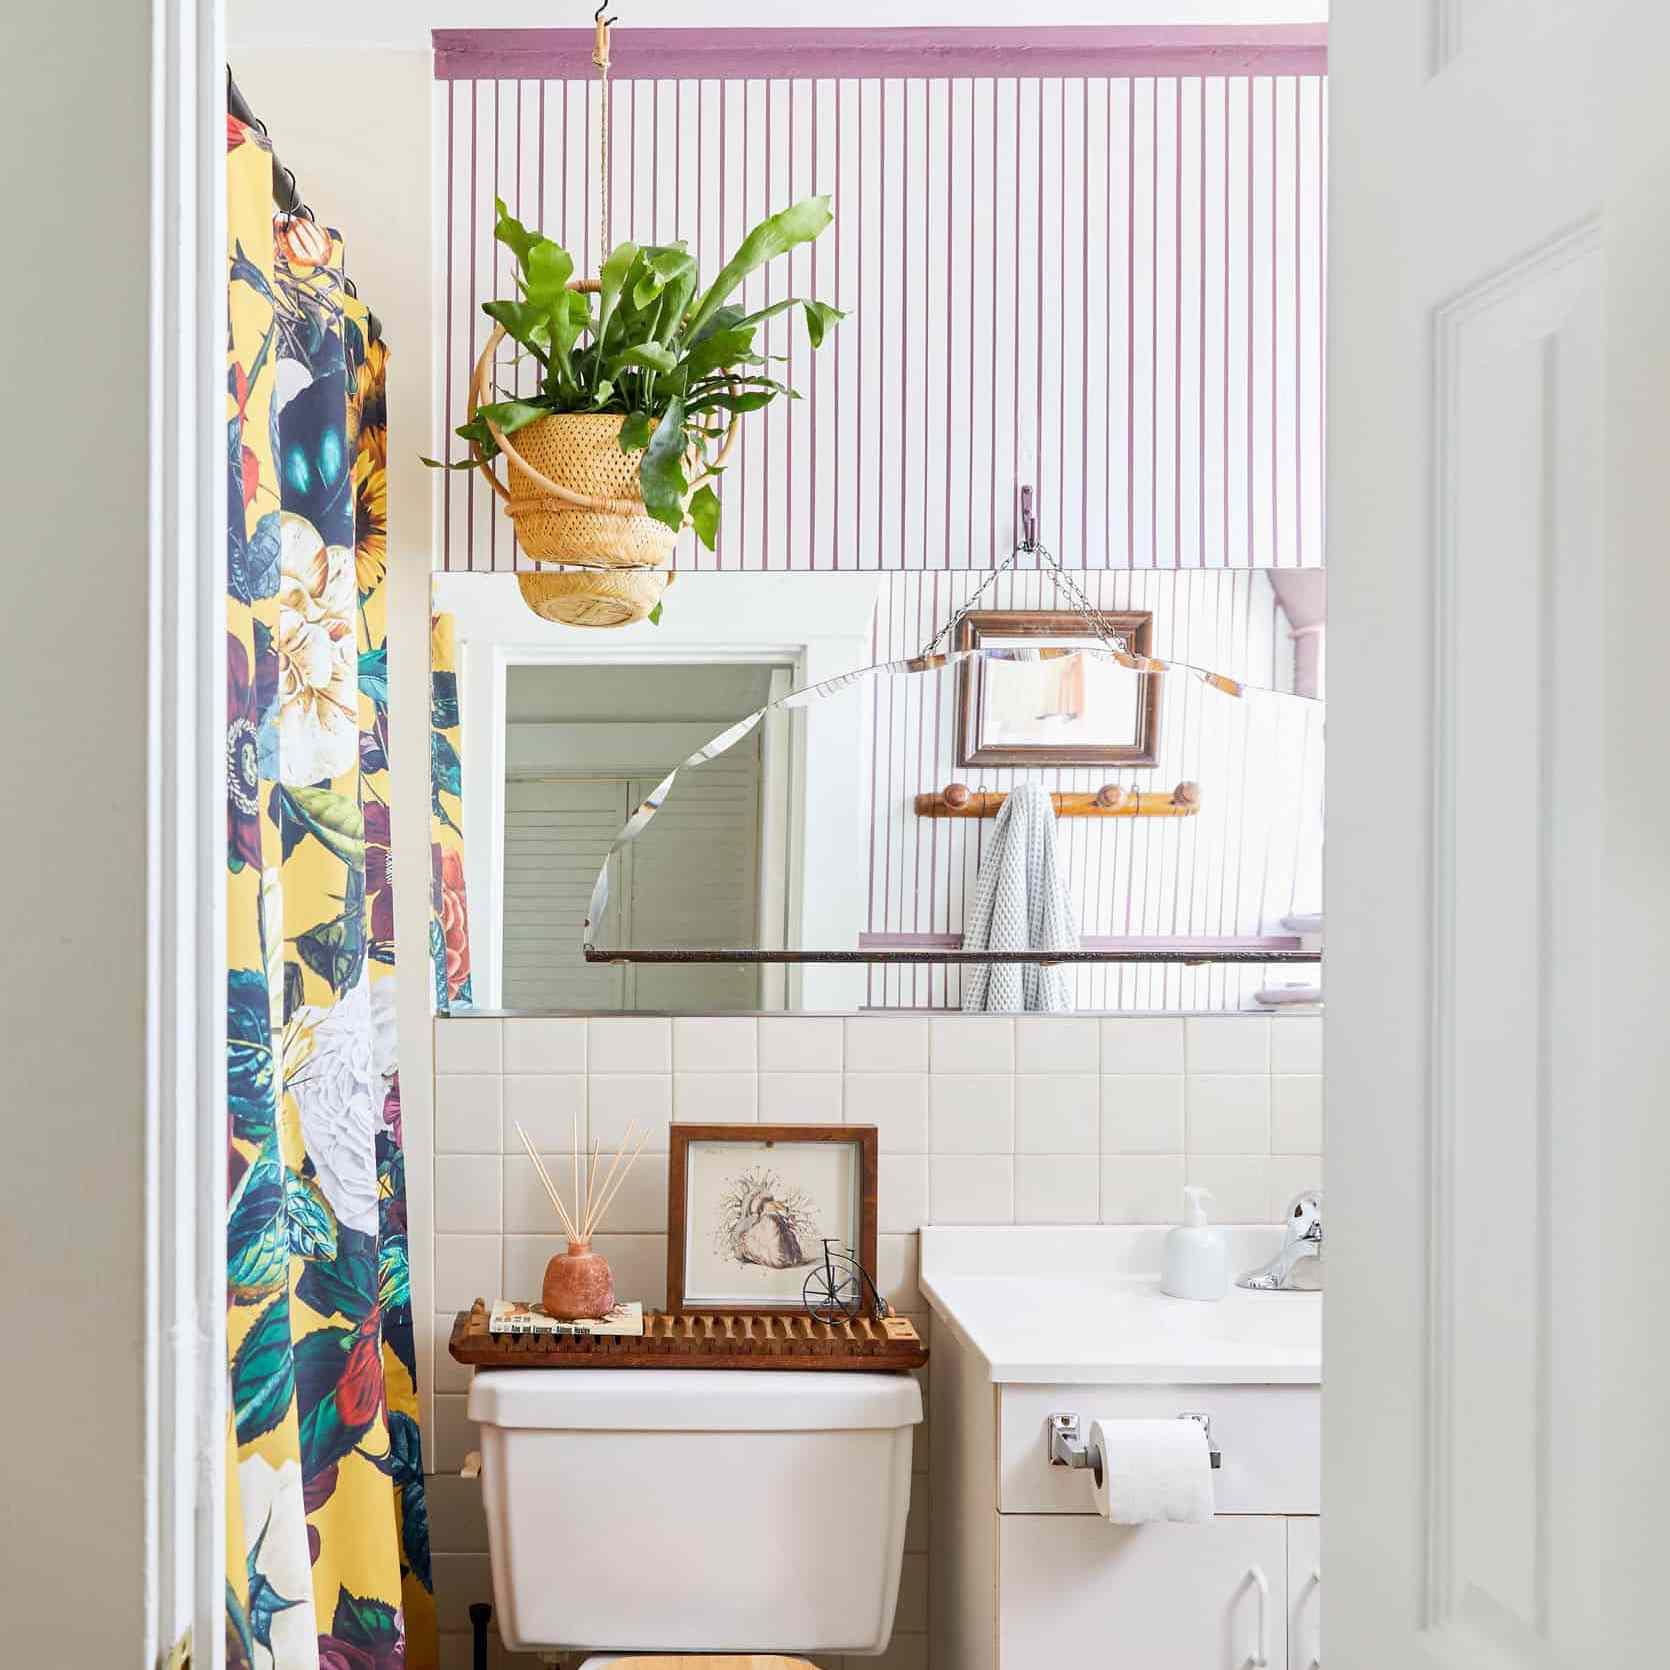 Vibrant shower curtain in a bathroom